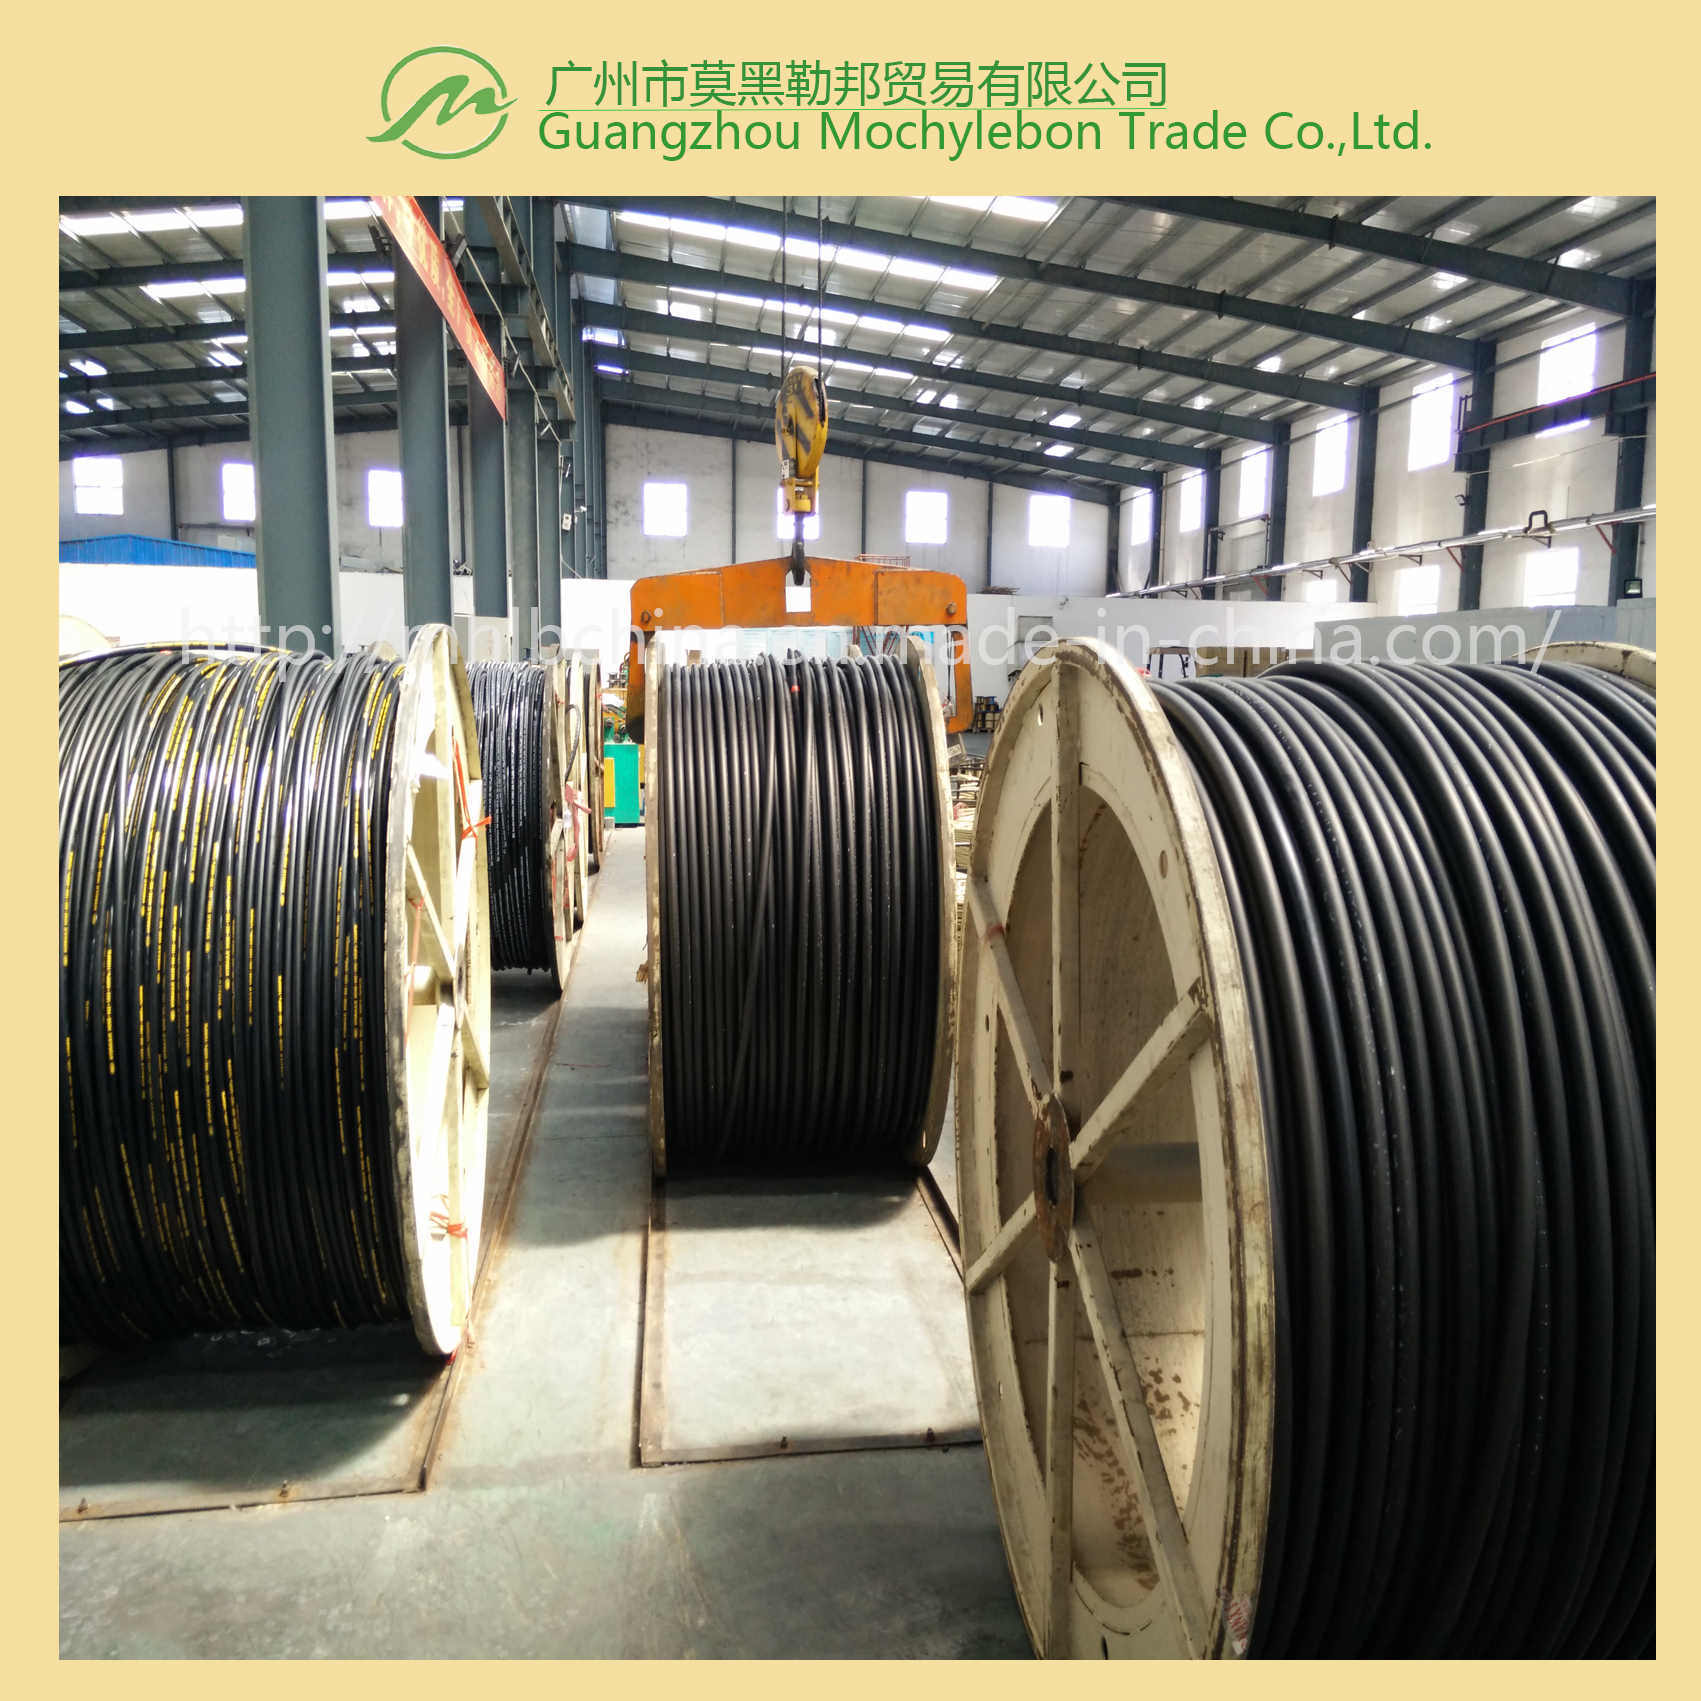 Wire Spiral Hydraulic Hose Fitting (EN856-4SP-1-1/4)